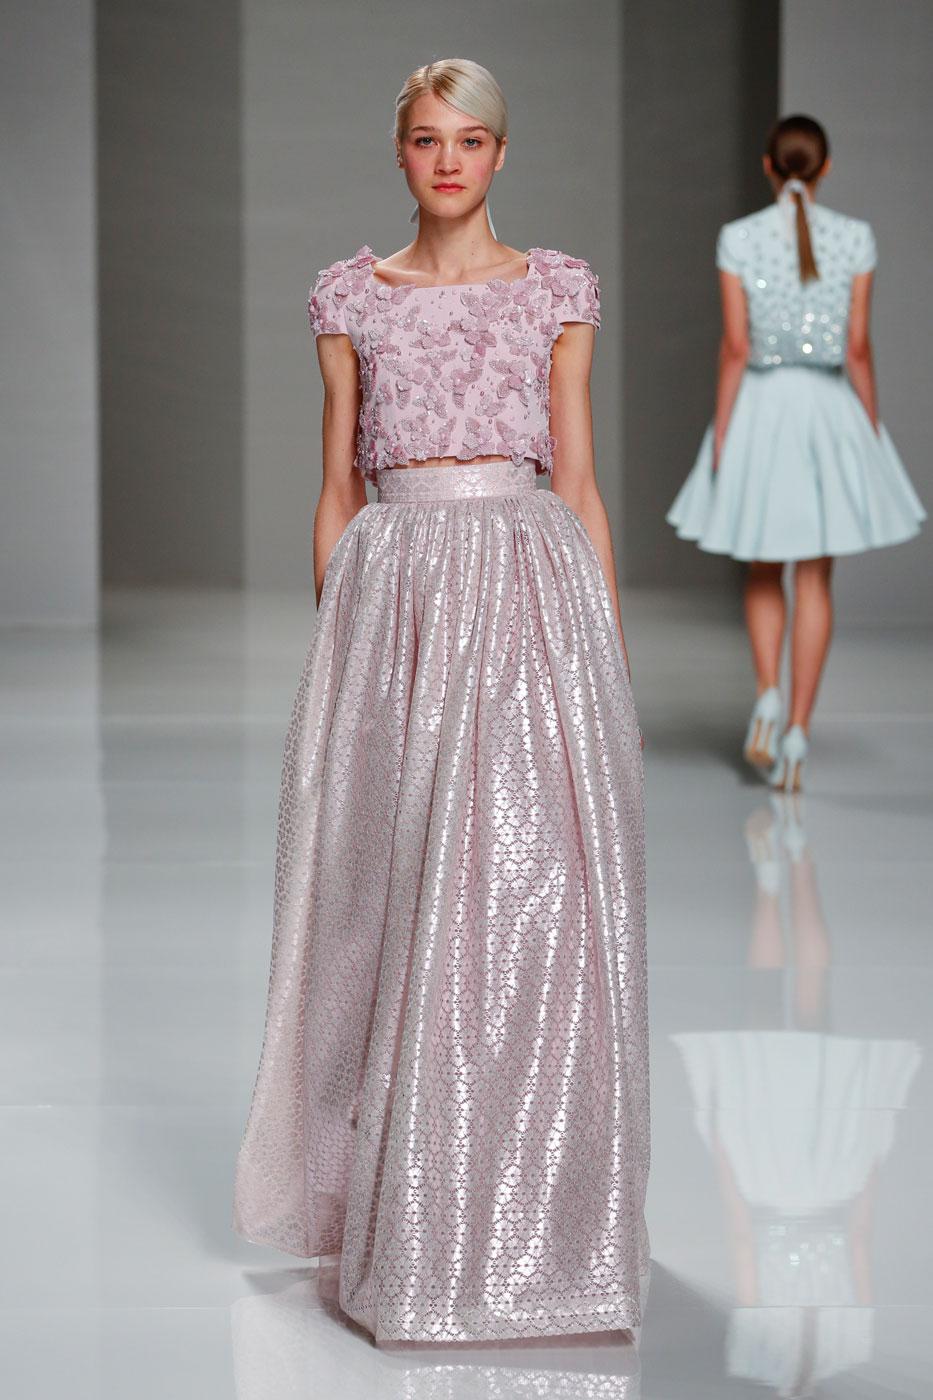 Georges-Hobeika-fashion-runway-show-haute-couture-paris-spring-2015-the-impression-13